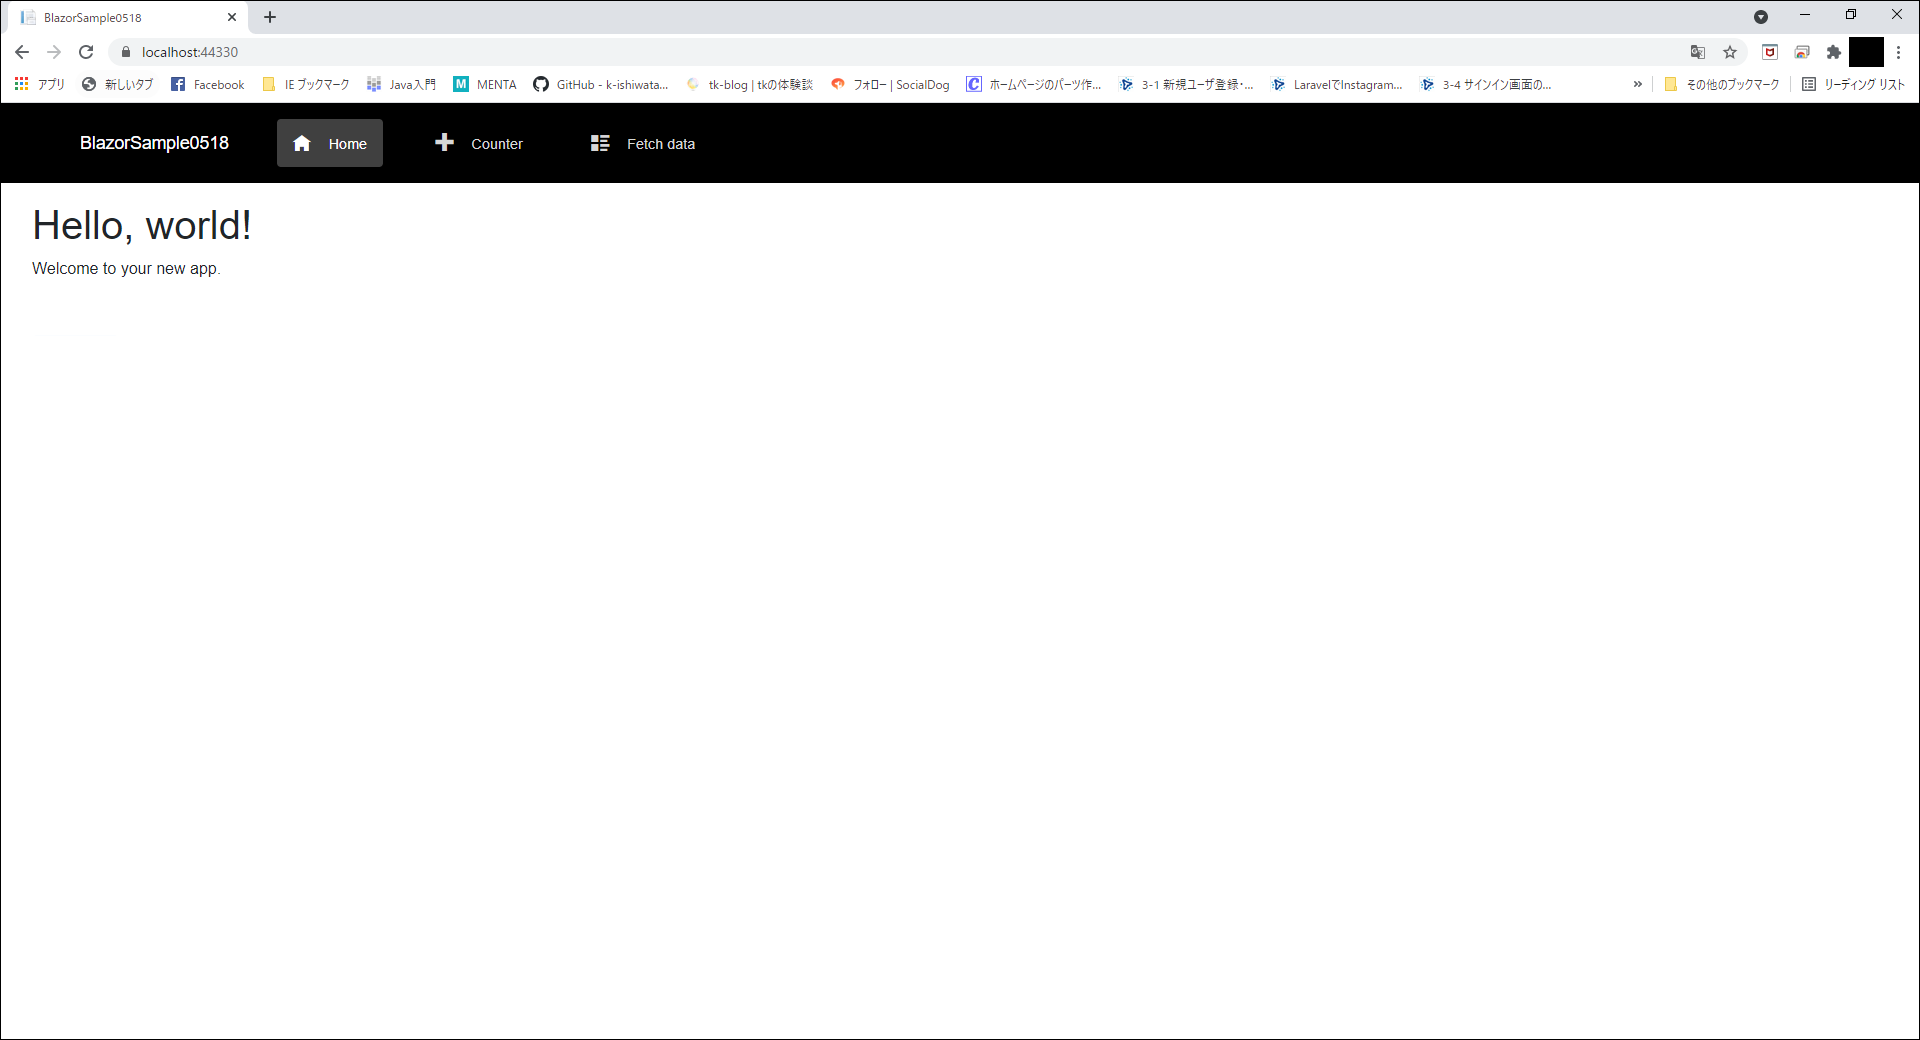 blazor_sidebar_display_edit1.png